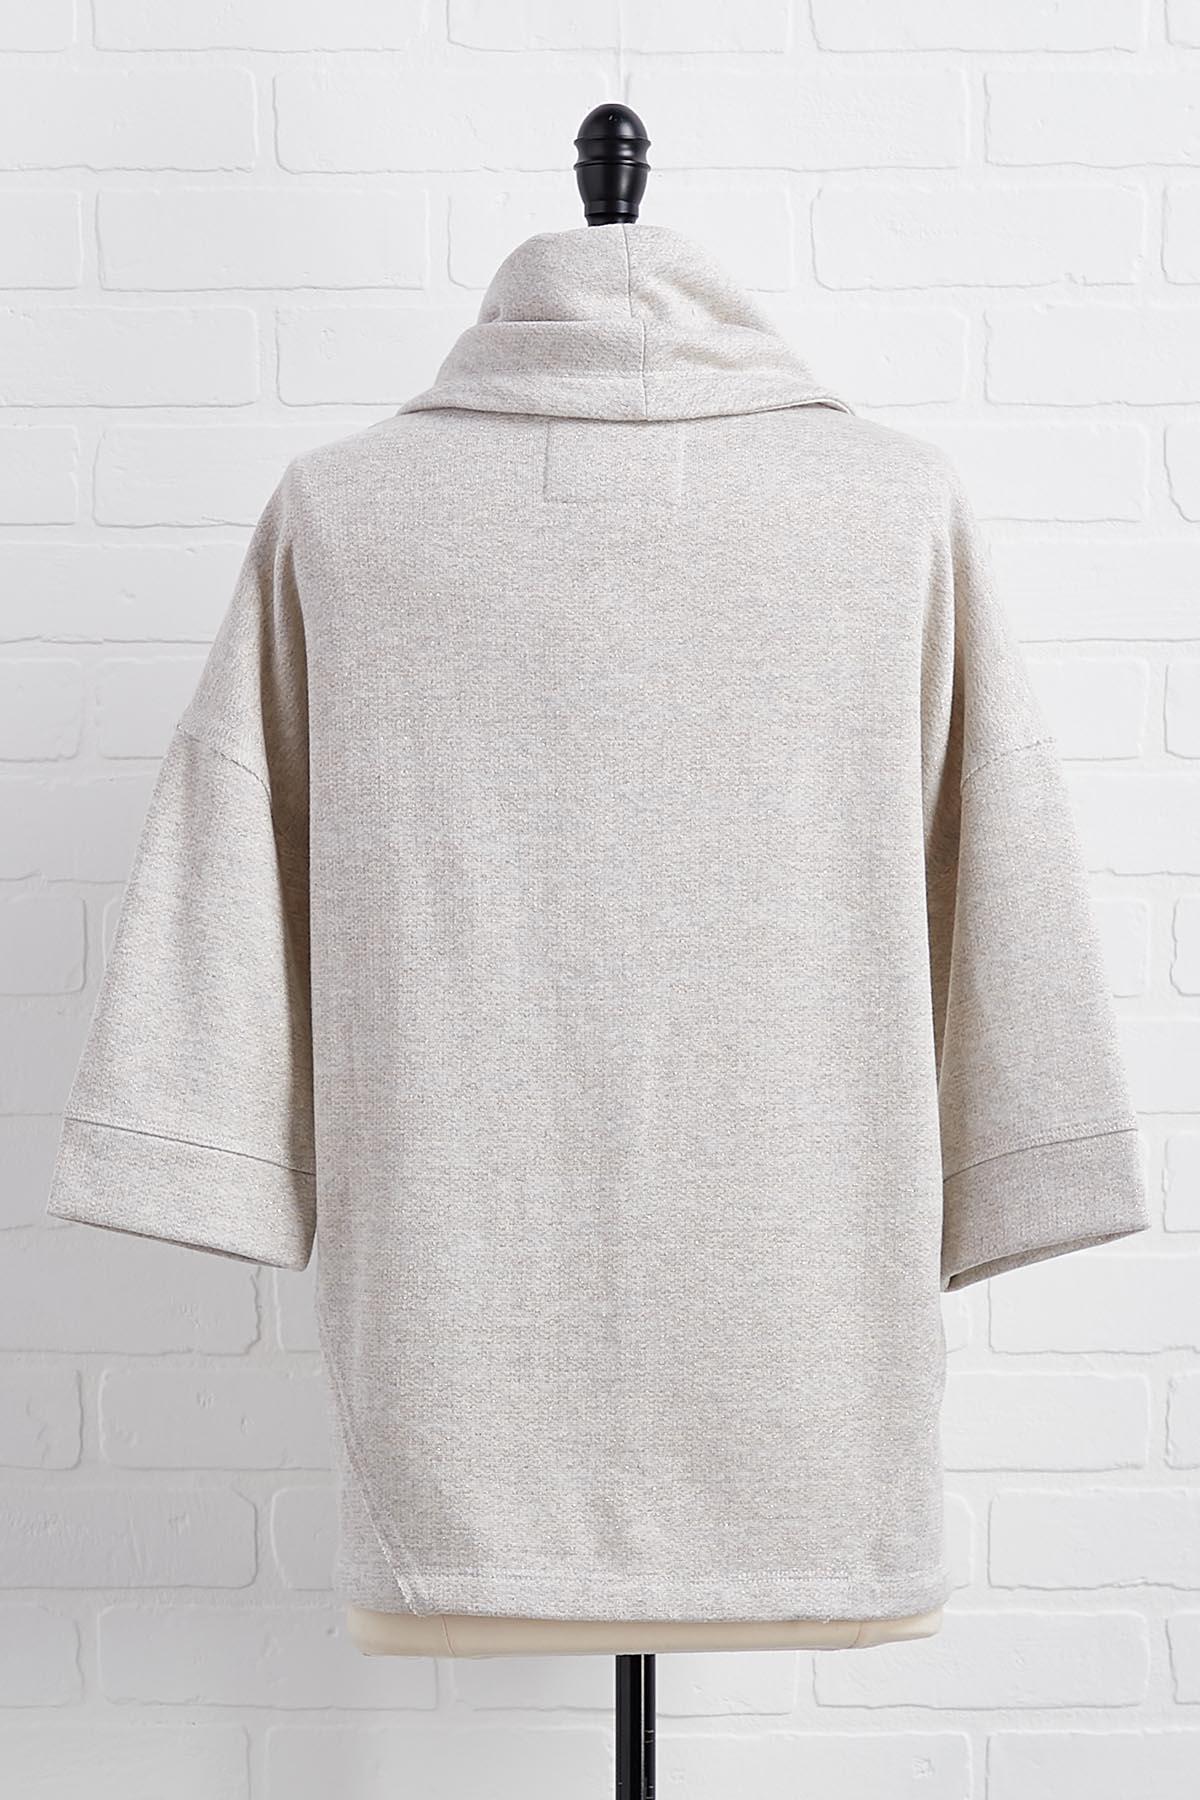 A Dash Of Dazzle Pullover Top